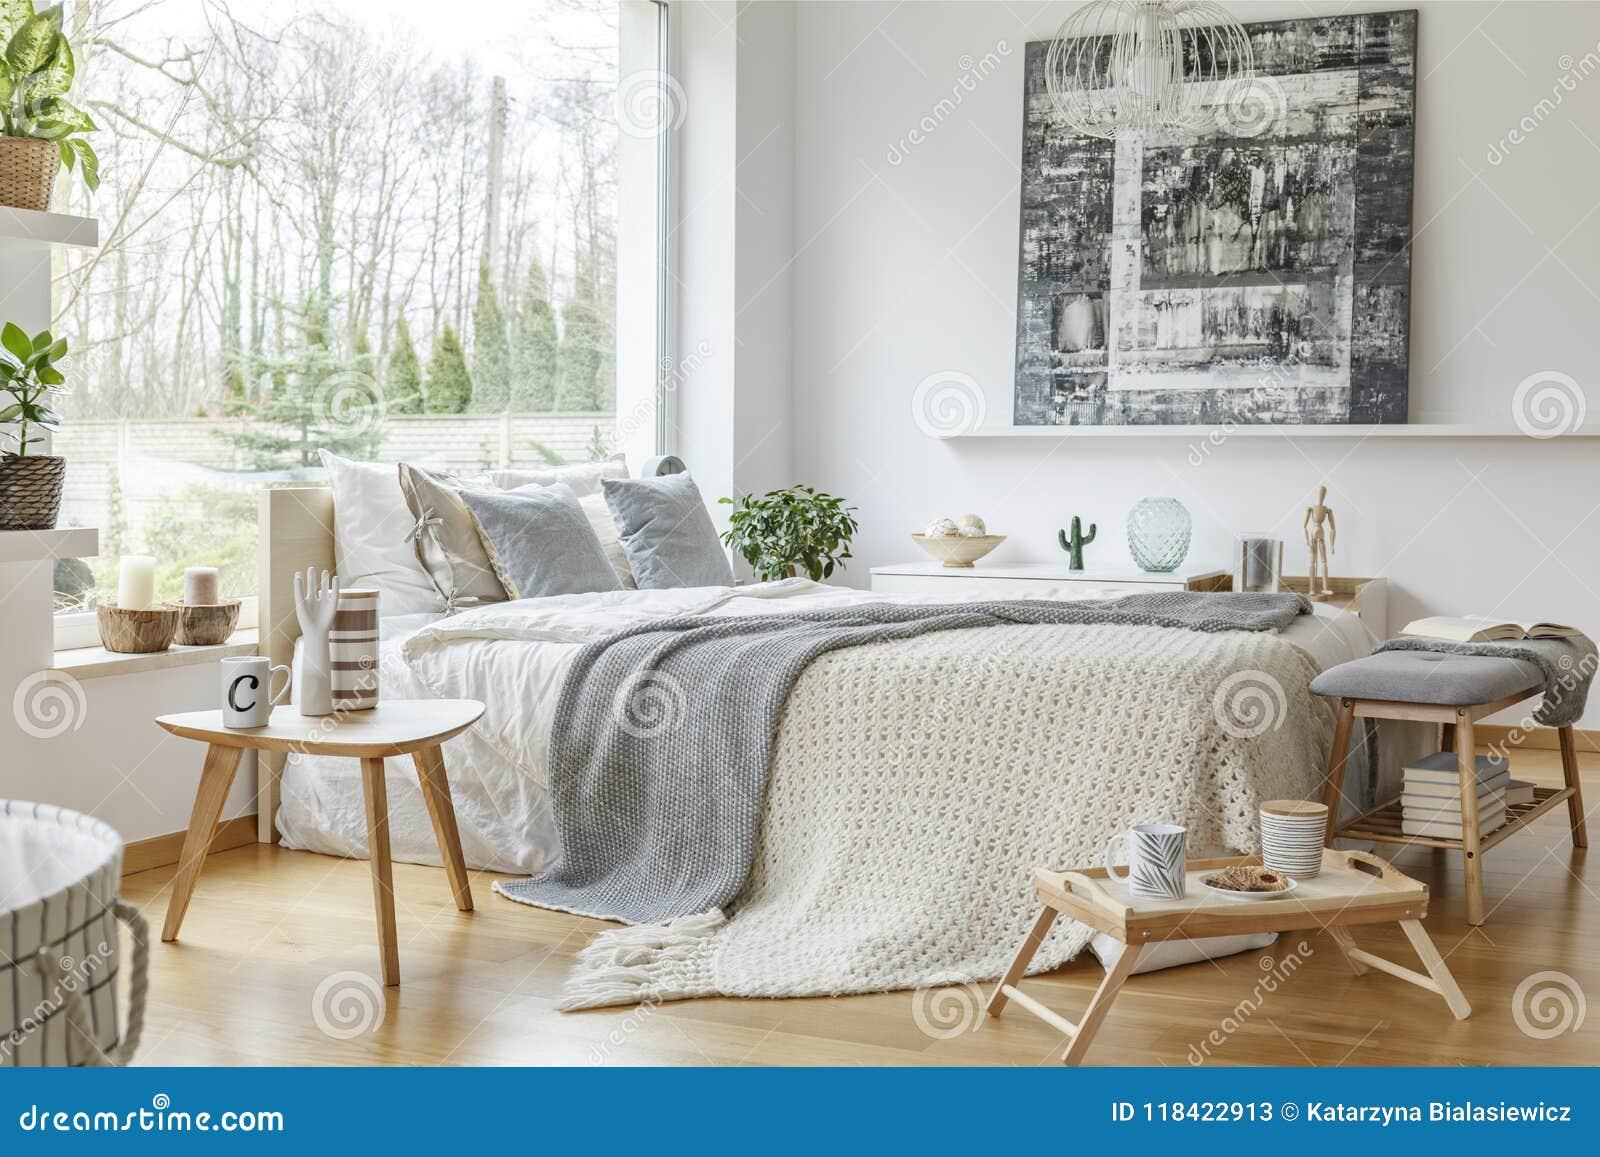 Cozy Bedroom Interior Stock Image Image Of Furniture 118422913